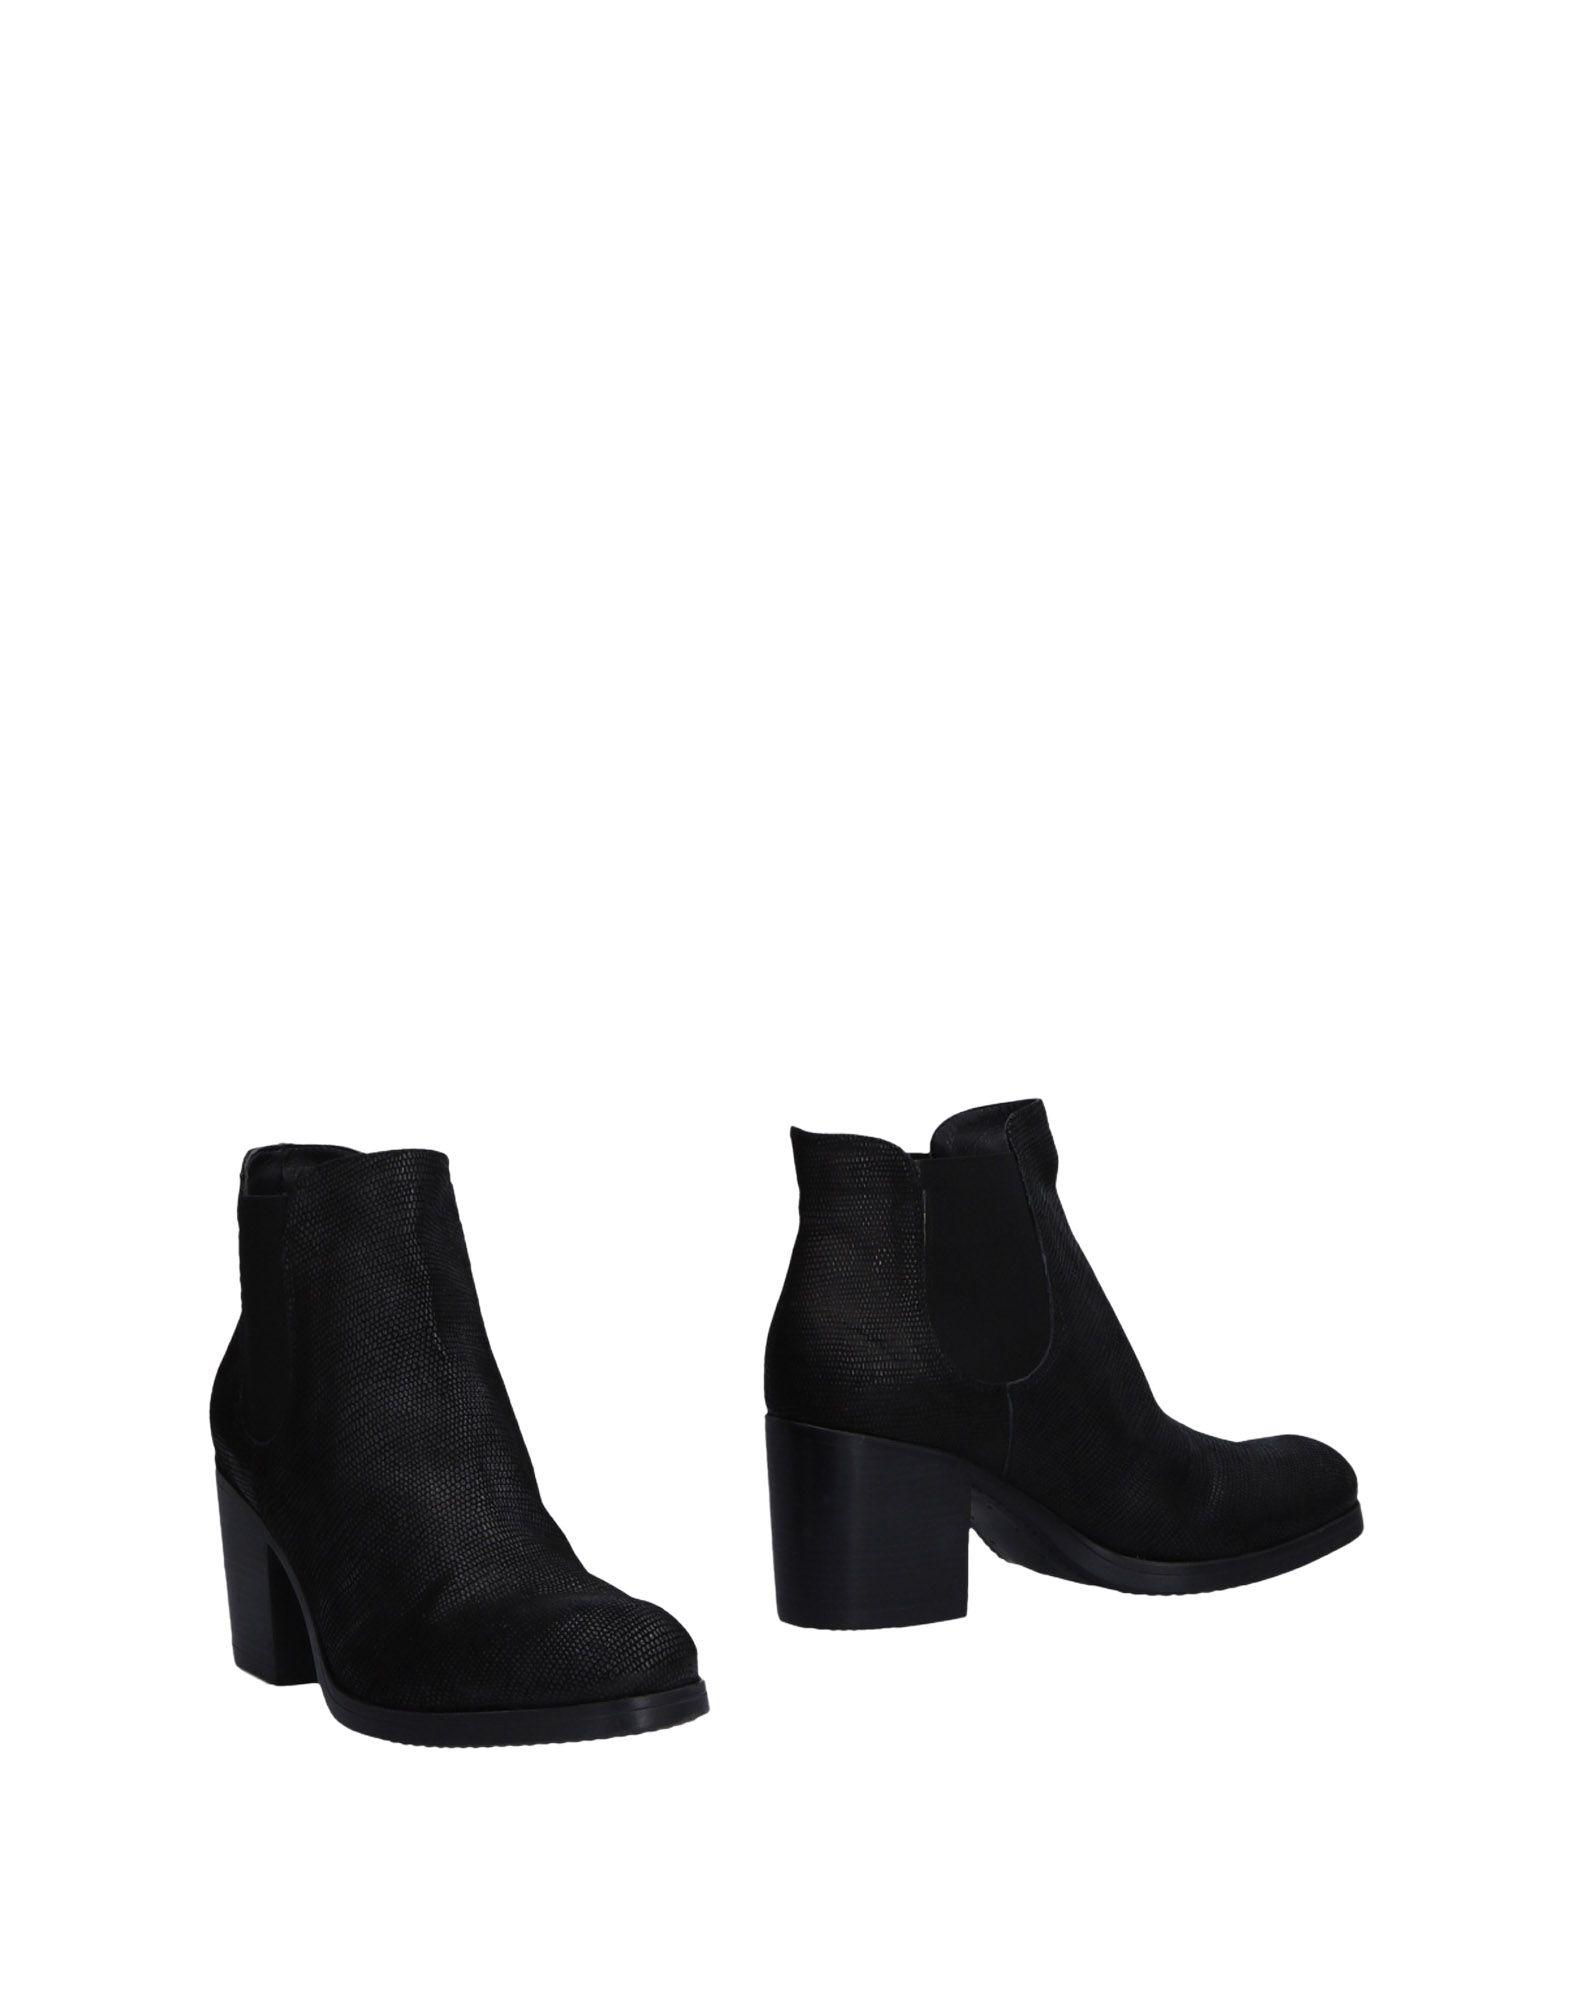 Formentini Chelsea Gute Boots Damen  11479021HQ Gute Chelsea Qualität beliebte Schuhe fba13c